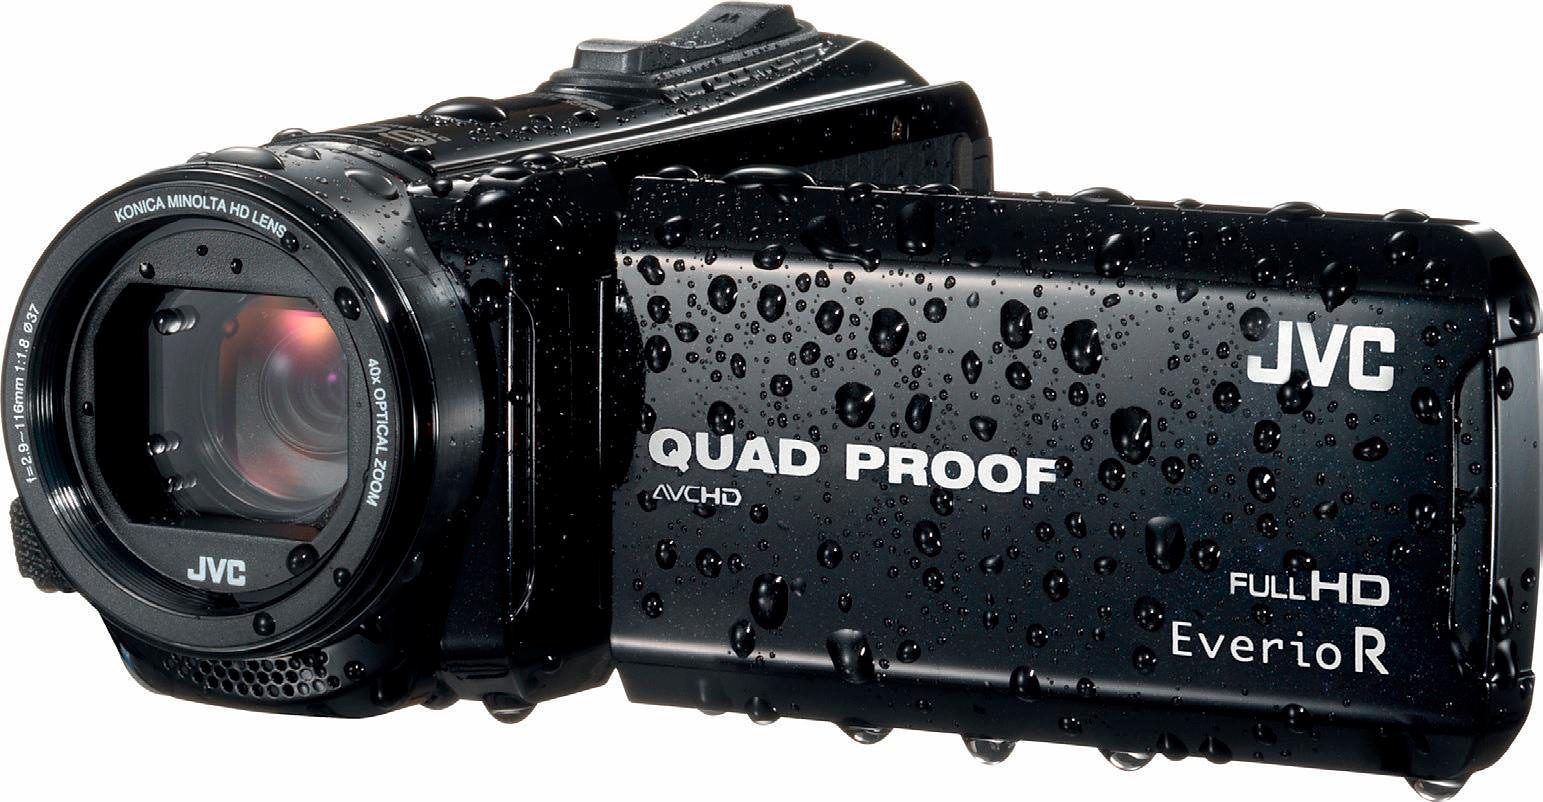 JVC GZ-R410BEU 1080p (Full HD) Camcorder, Staubfest